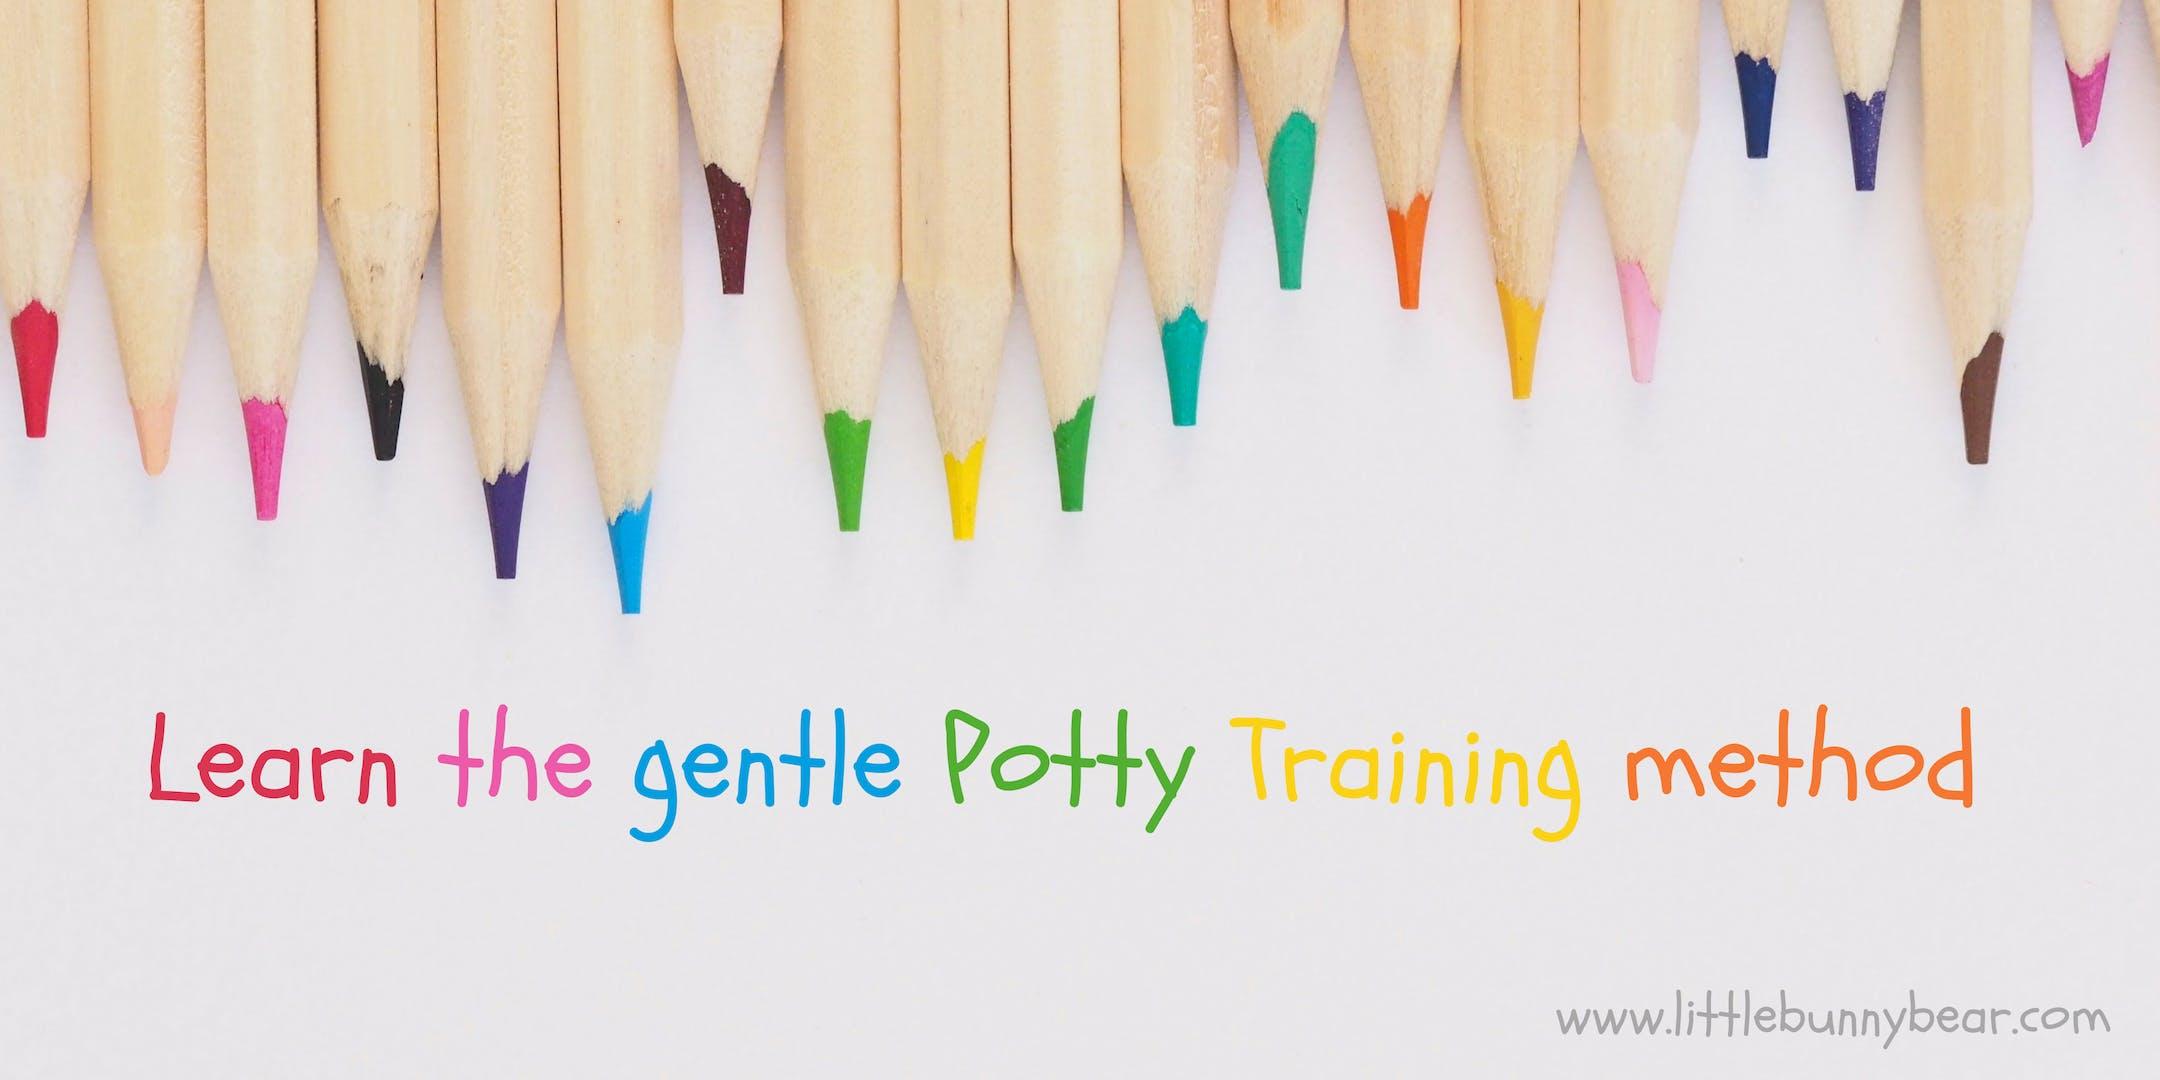 Potty Masters: Gentle potty training class fo